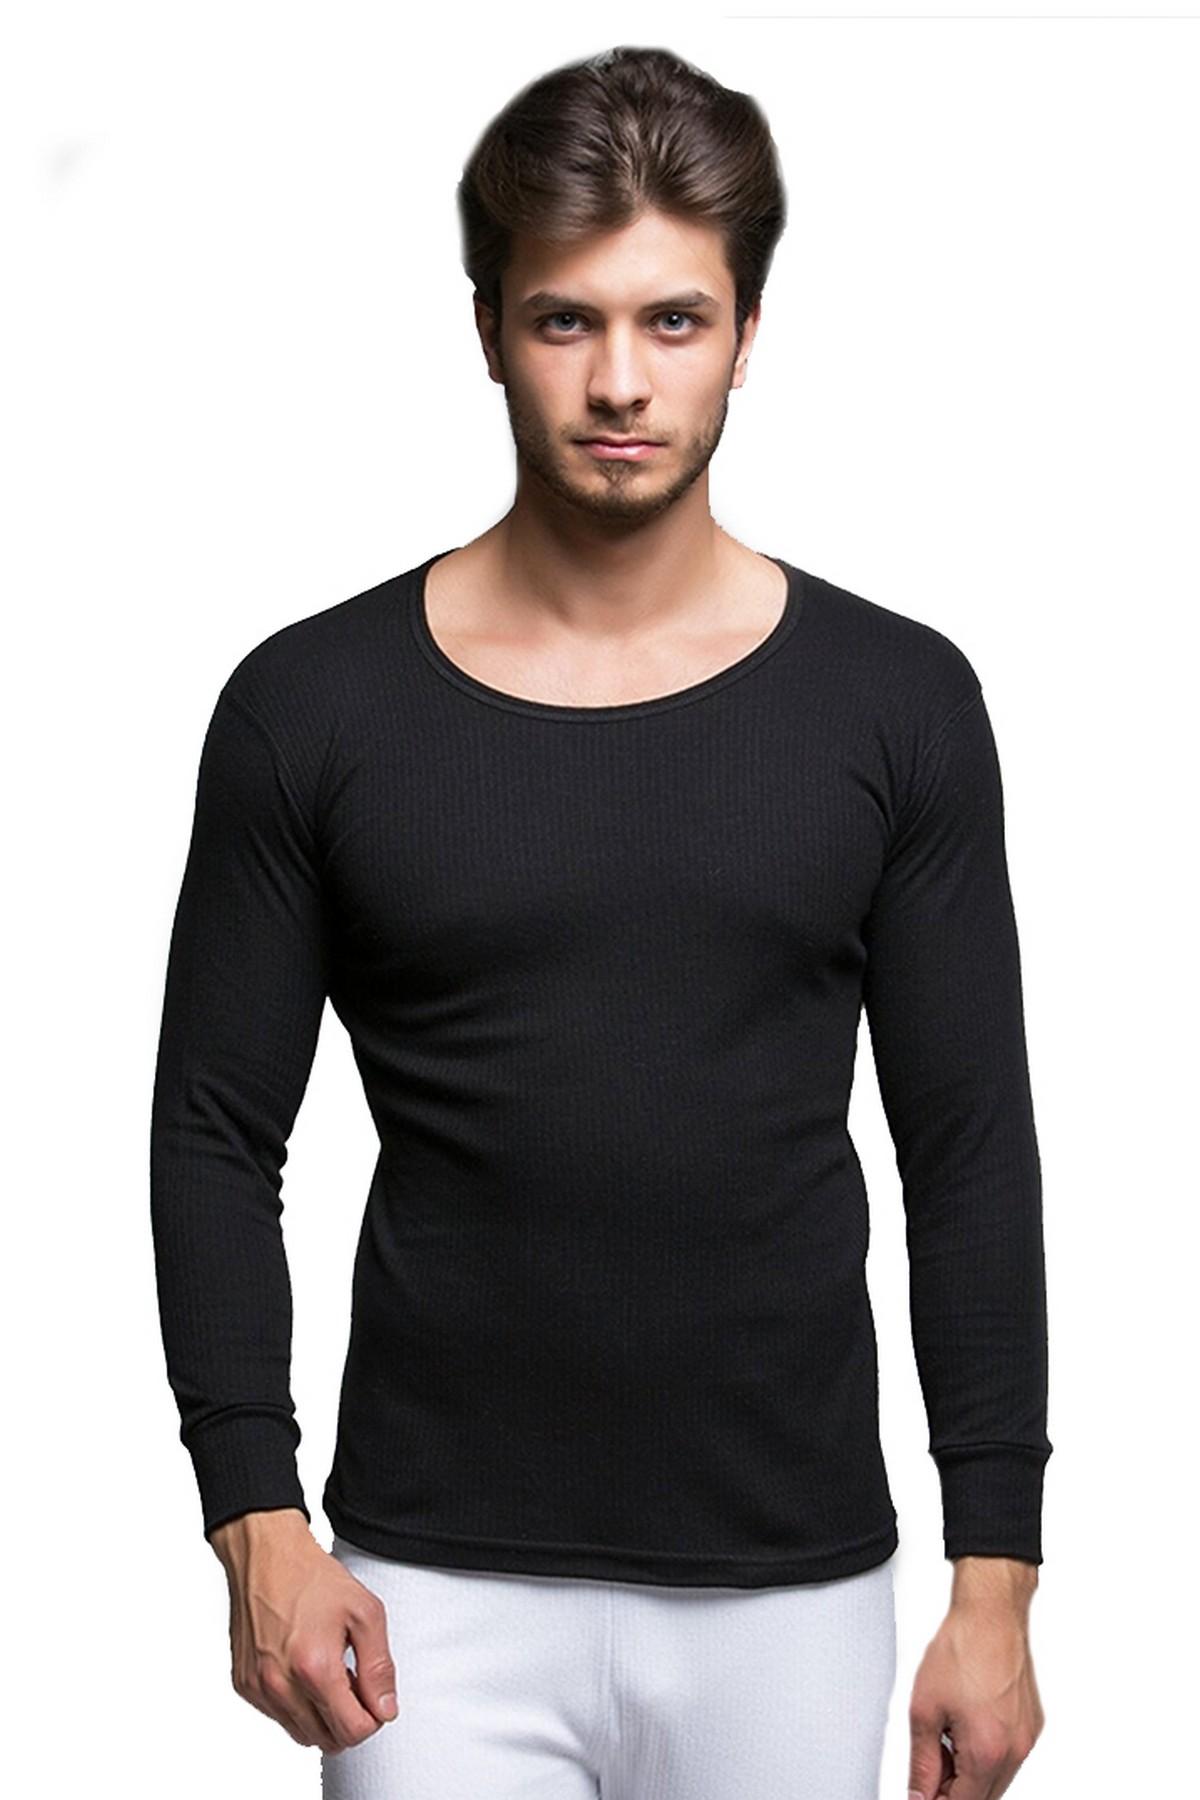 Thermoform Pure Erkek Termal Uzunkol İçlik Siyah (HZT20003-R001)